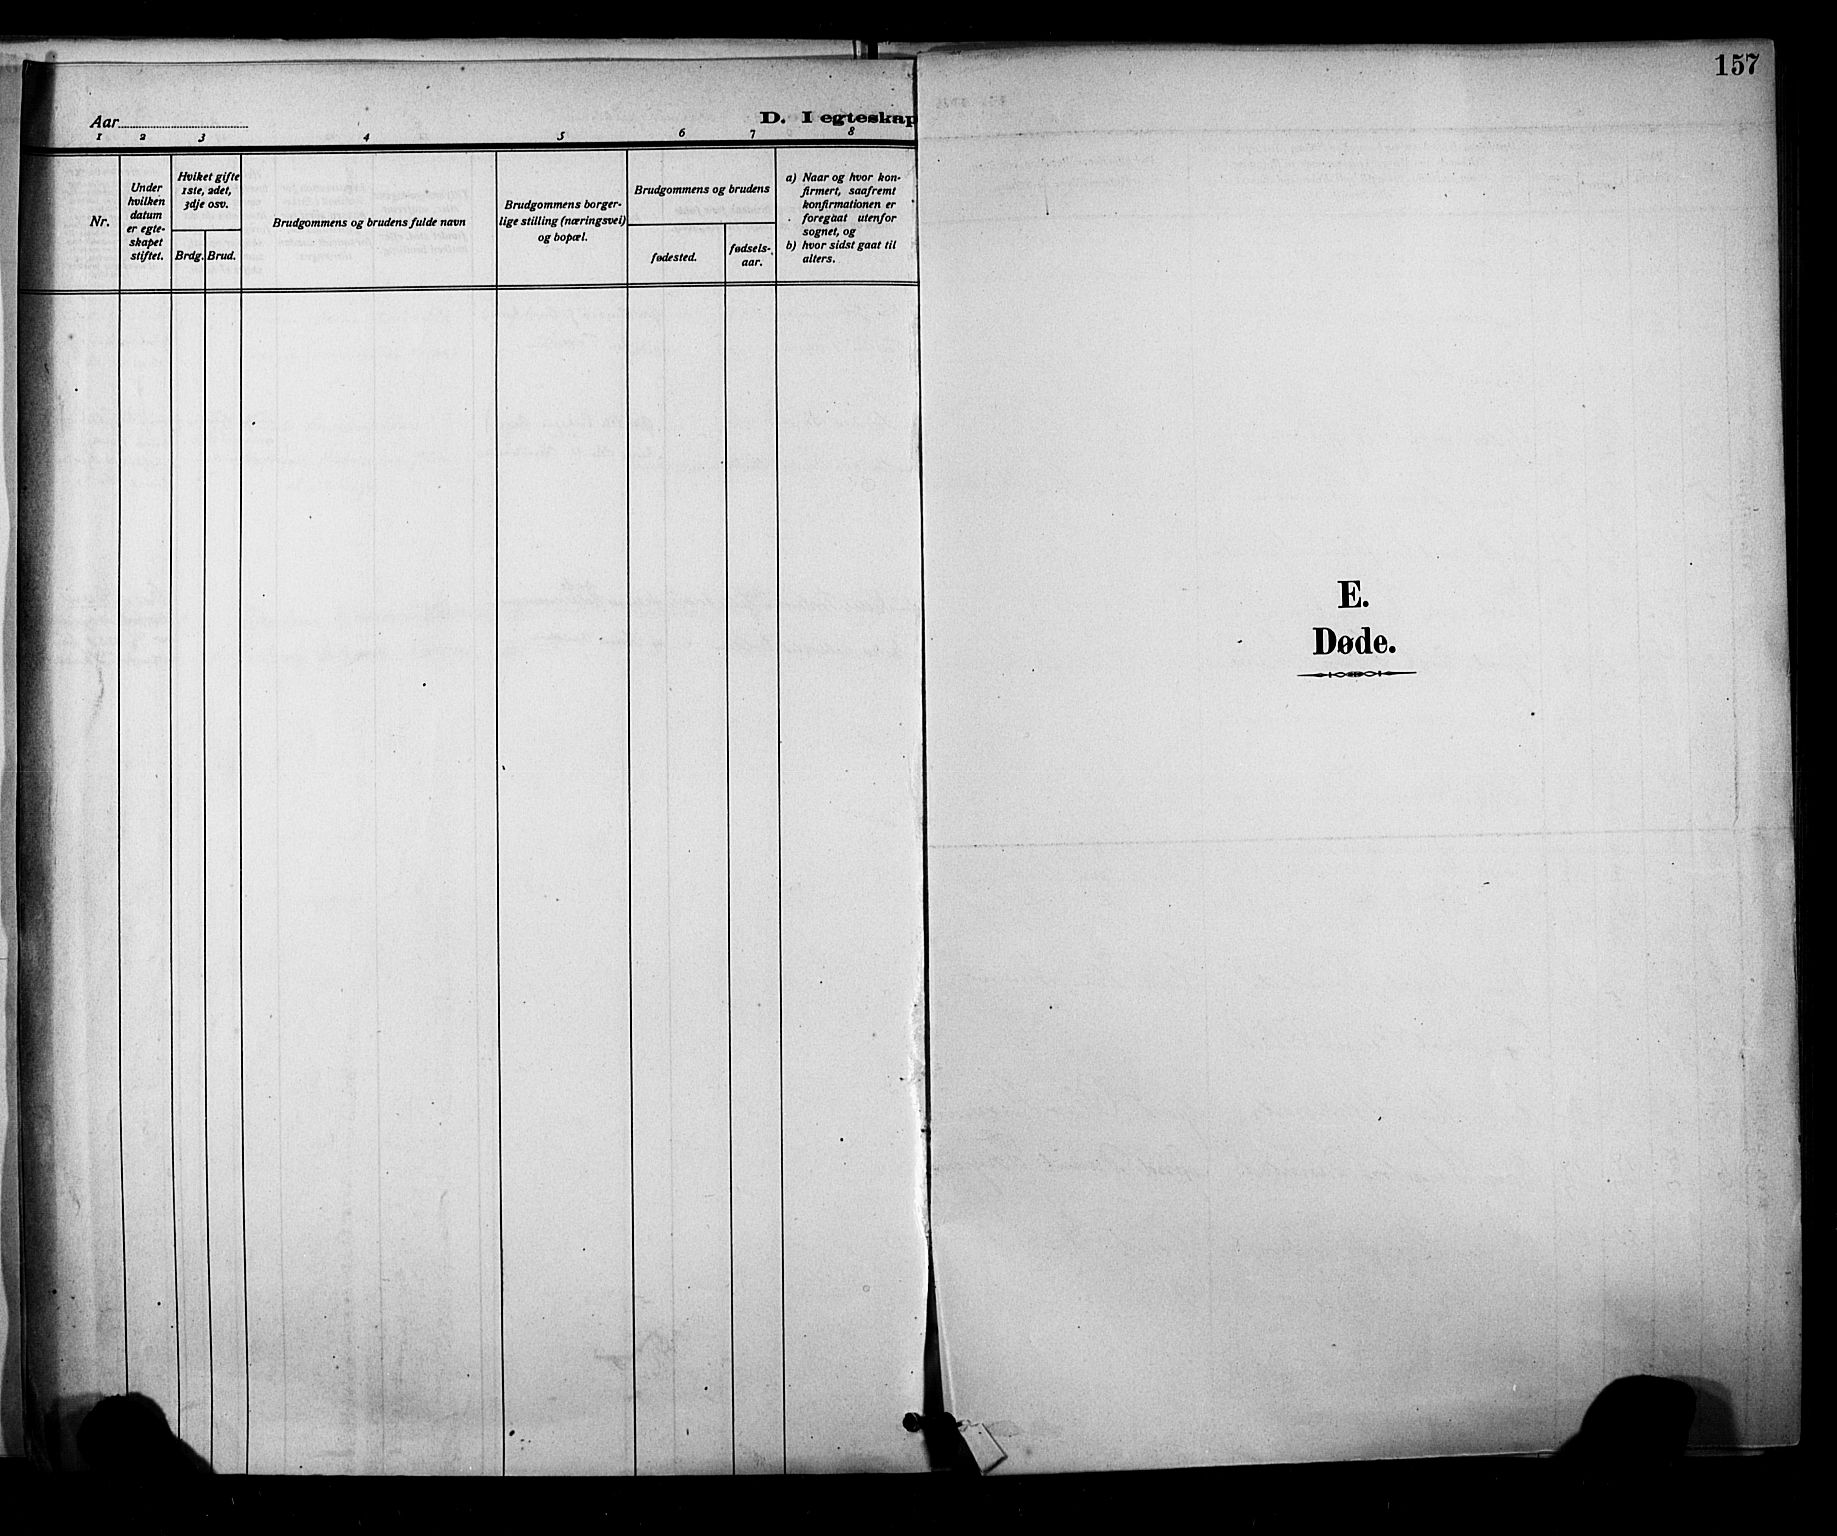 SAKO, Sauherad kirkebøker, F/Fa/L0009: Ministerialbok nr. I 9, 1887-1912, s. 157